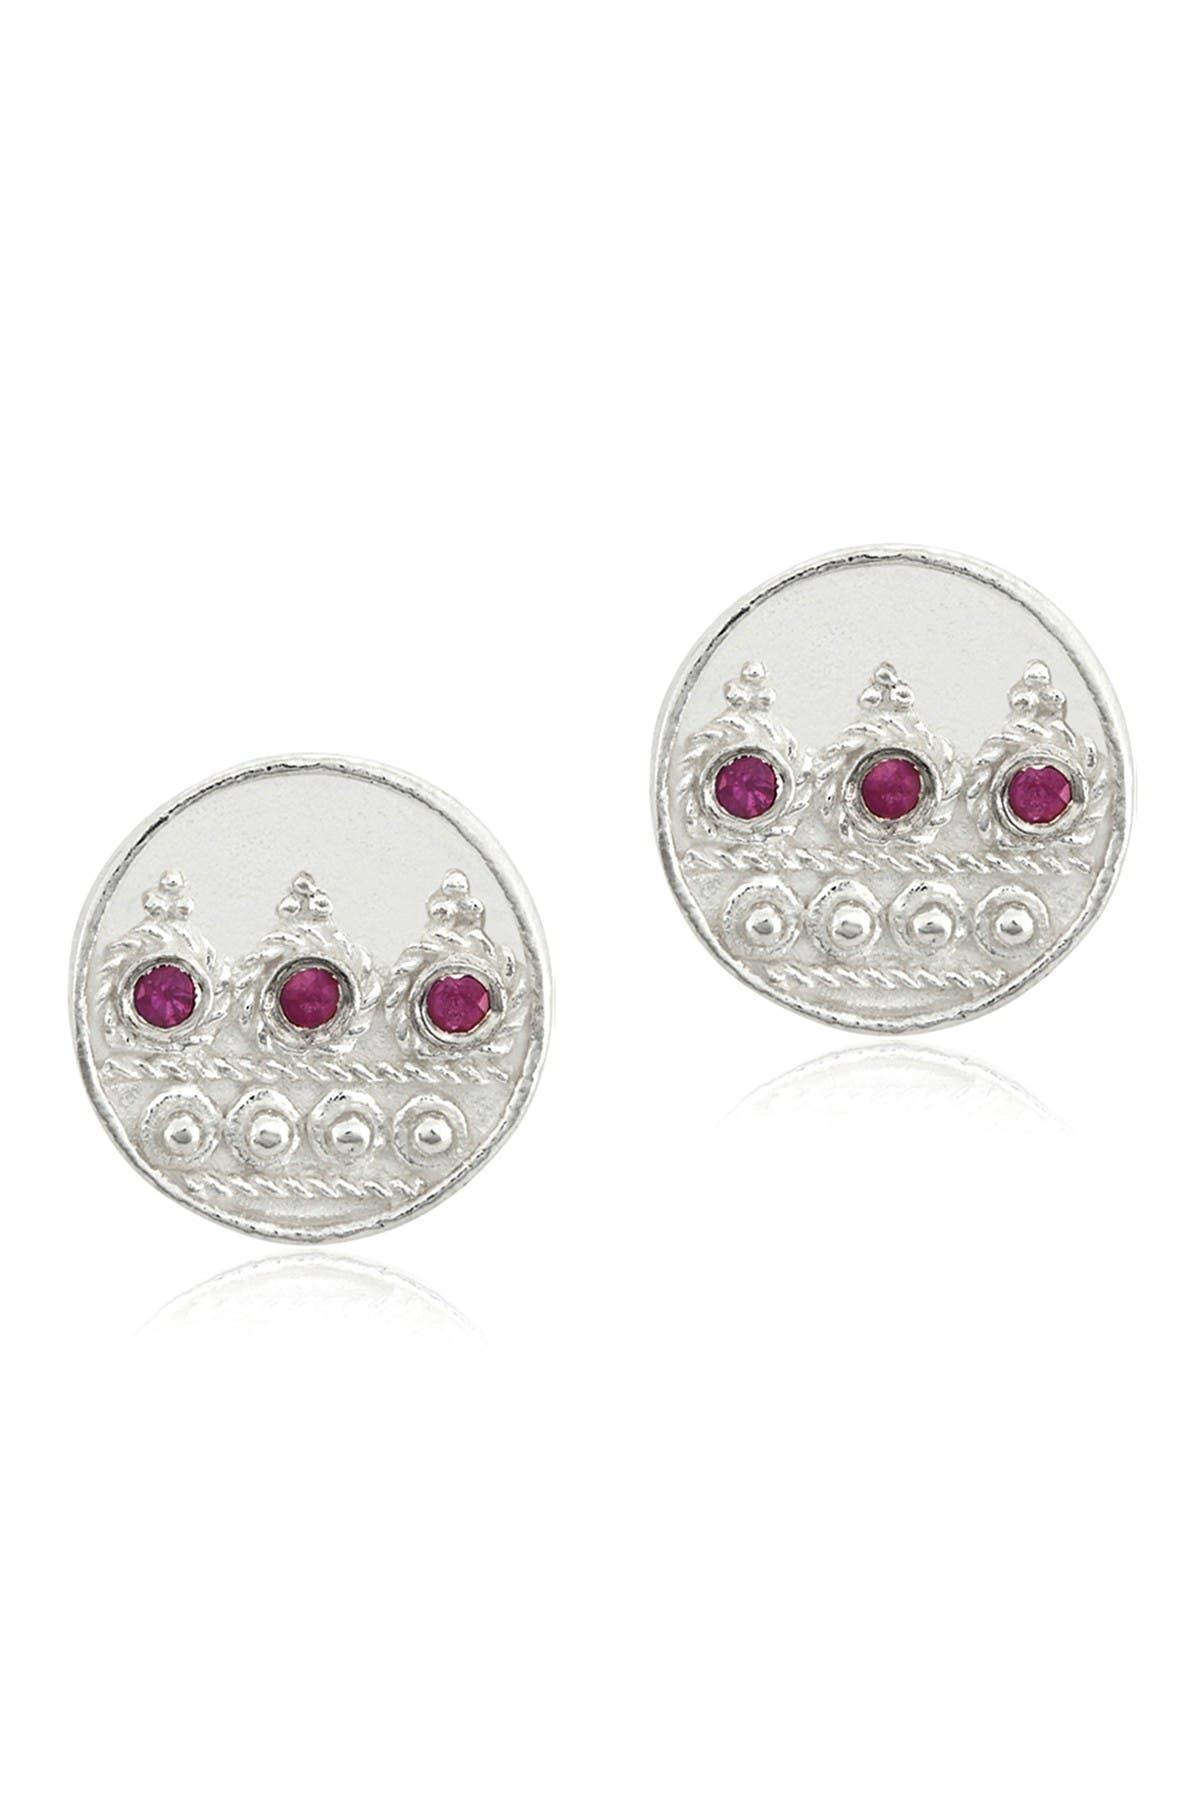 Image of LEGEND AMRAPALI SILVER Sterling Silver Heritage Moon Pink Ruby Stud Earrings